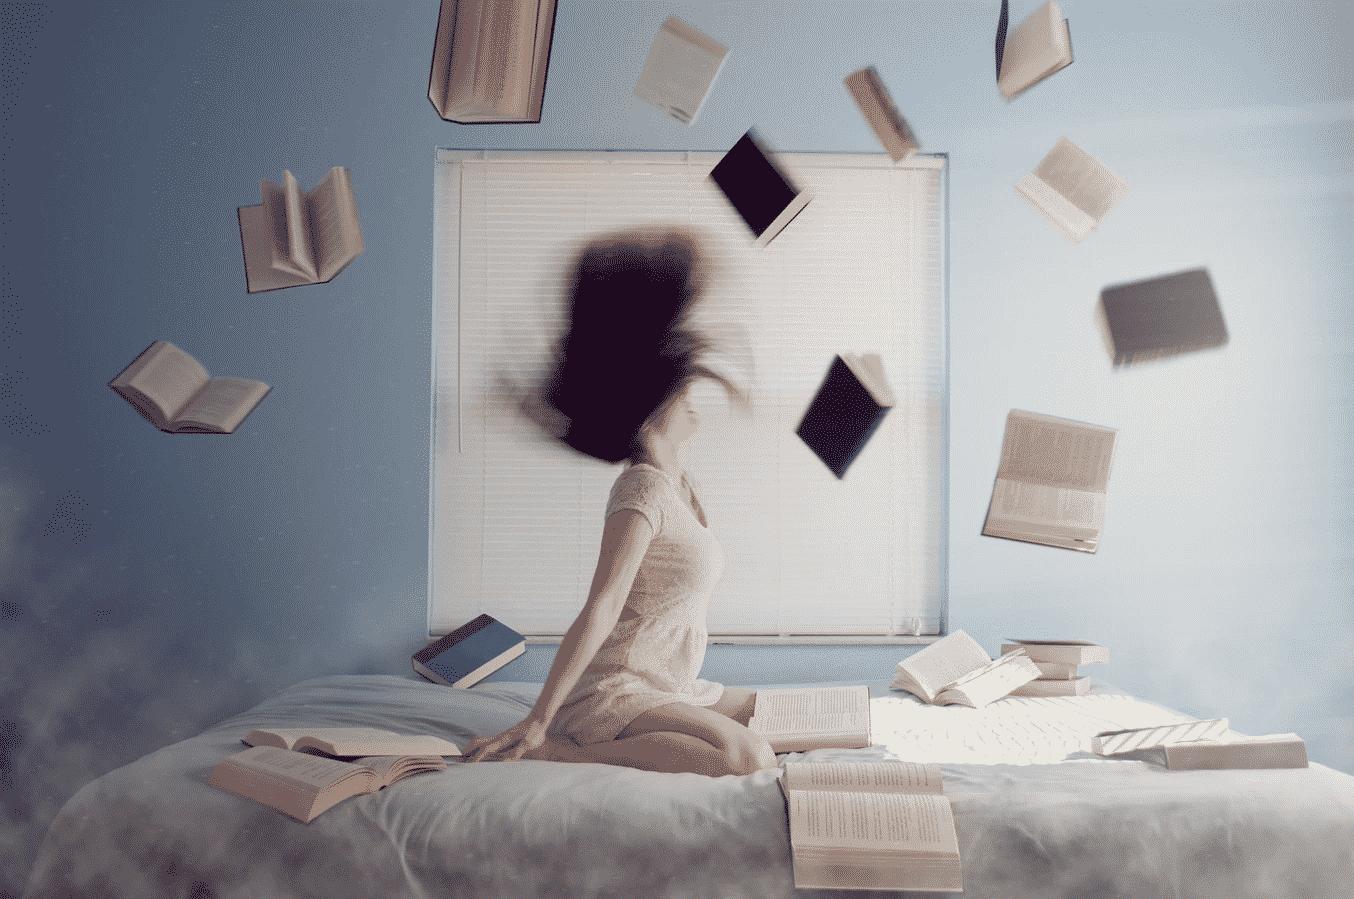 Woman Threw Books